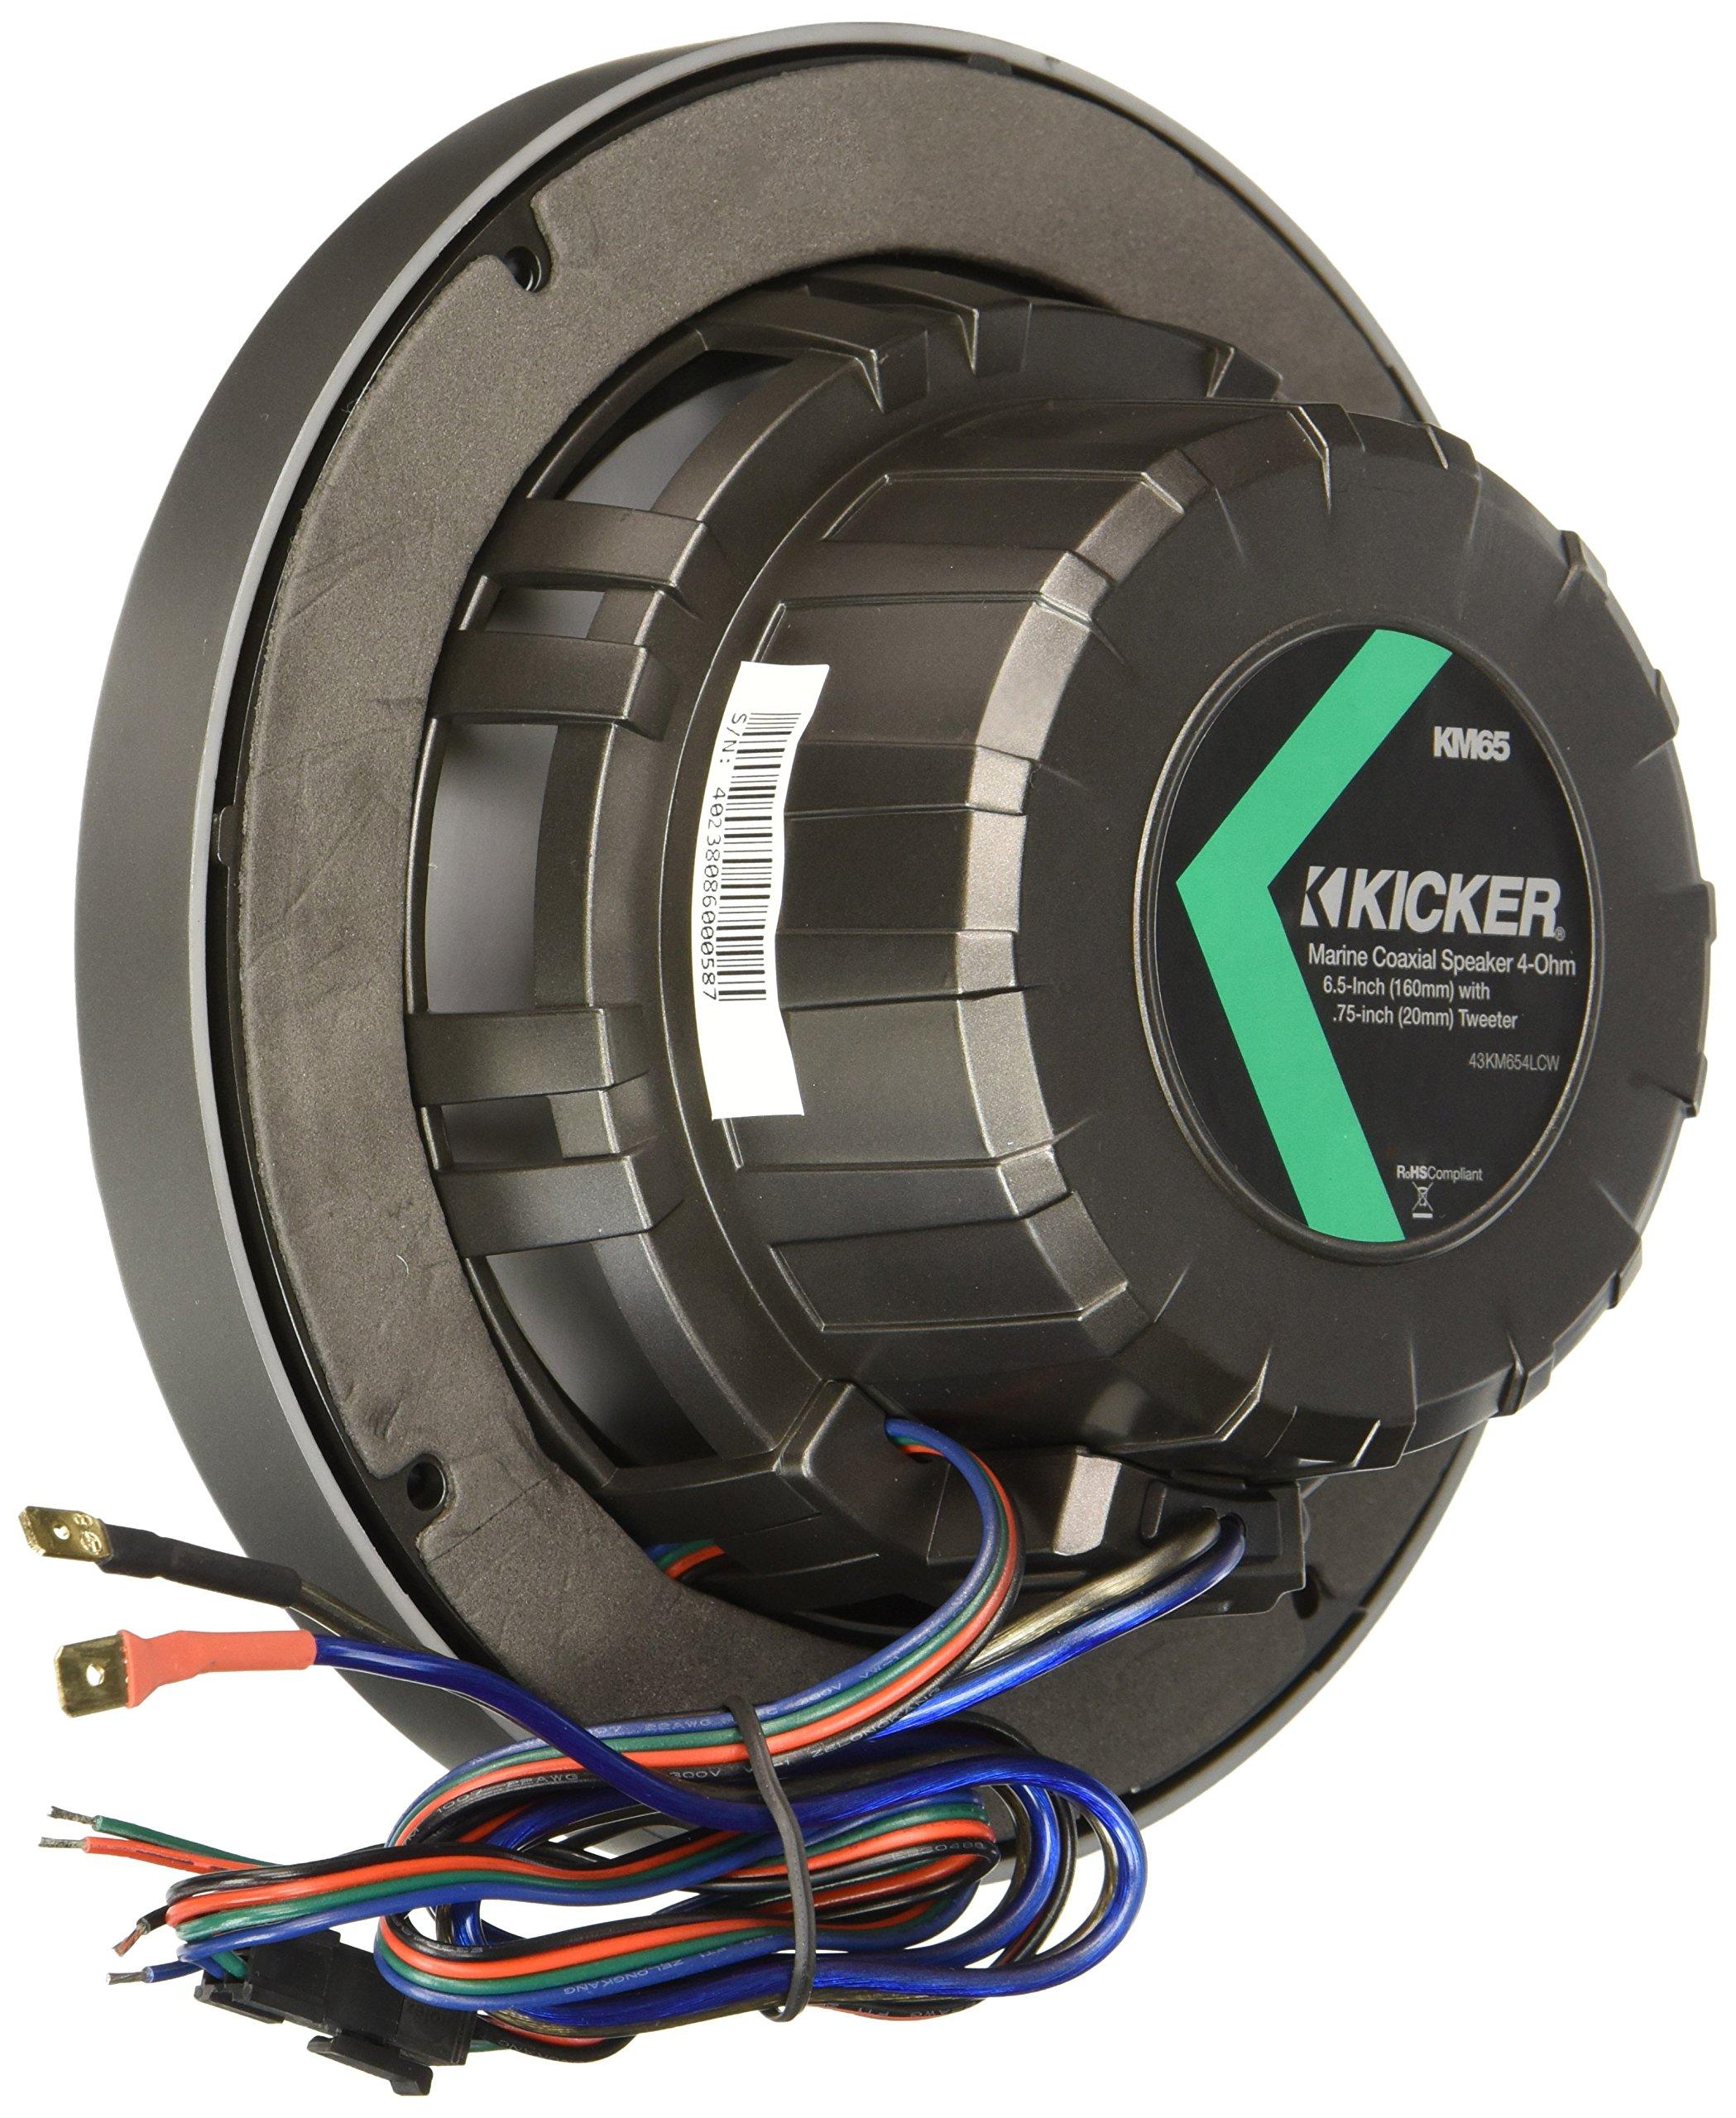 Kicker 6.5 Inch KM-Series LED Marine Speakers 43KM654LCW by Kicker (Image #2)